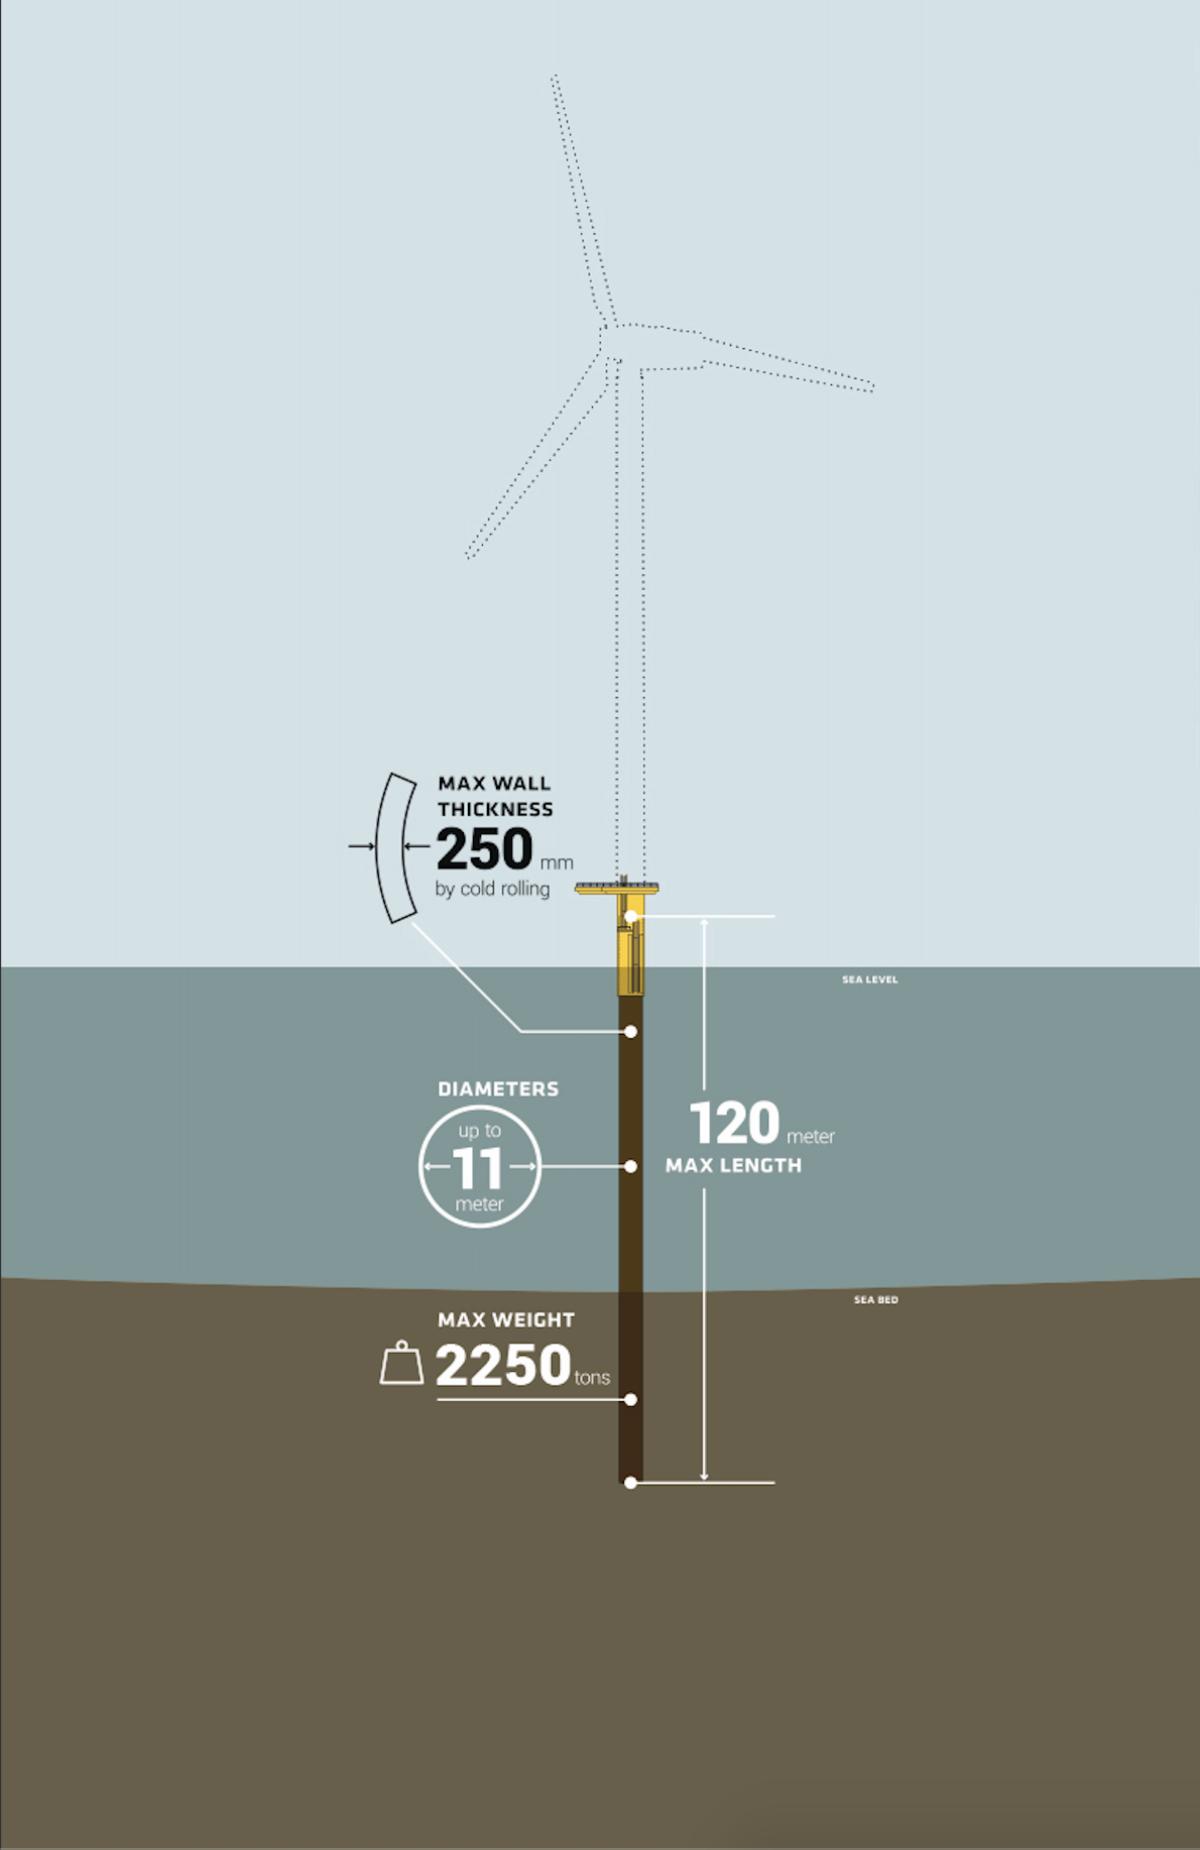 Sif windmill monopile